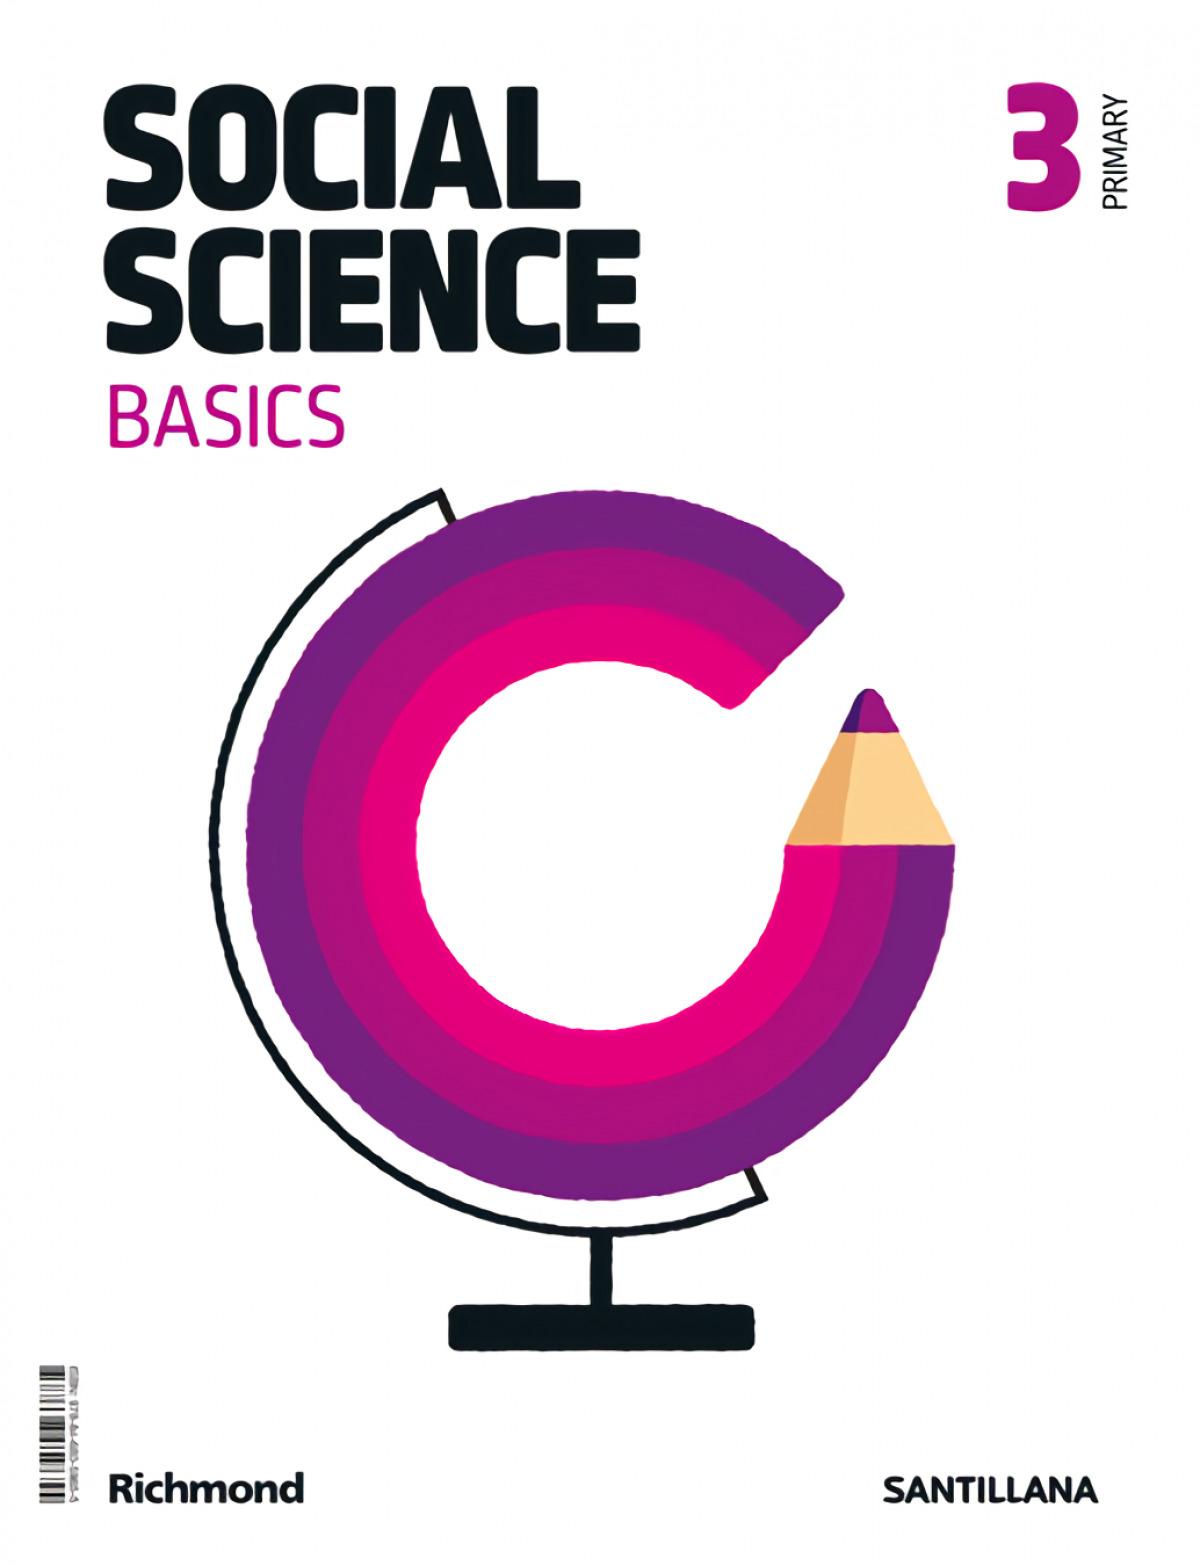 SOCIAL SCIENCE BASICS 3 PRIMARY